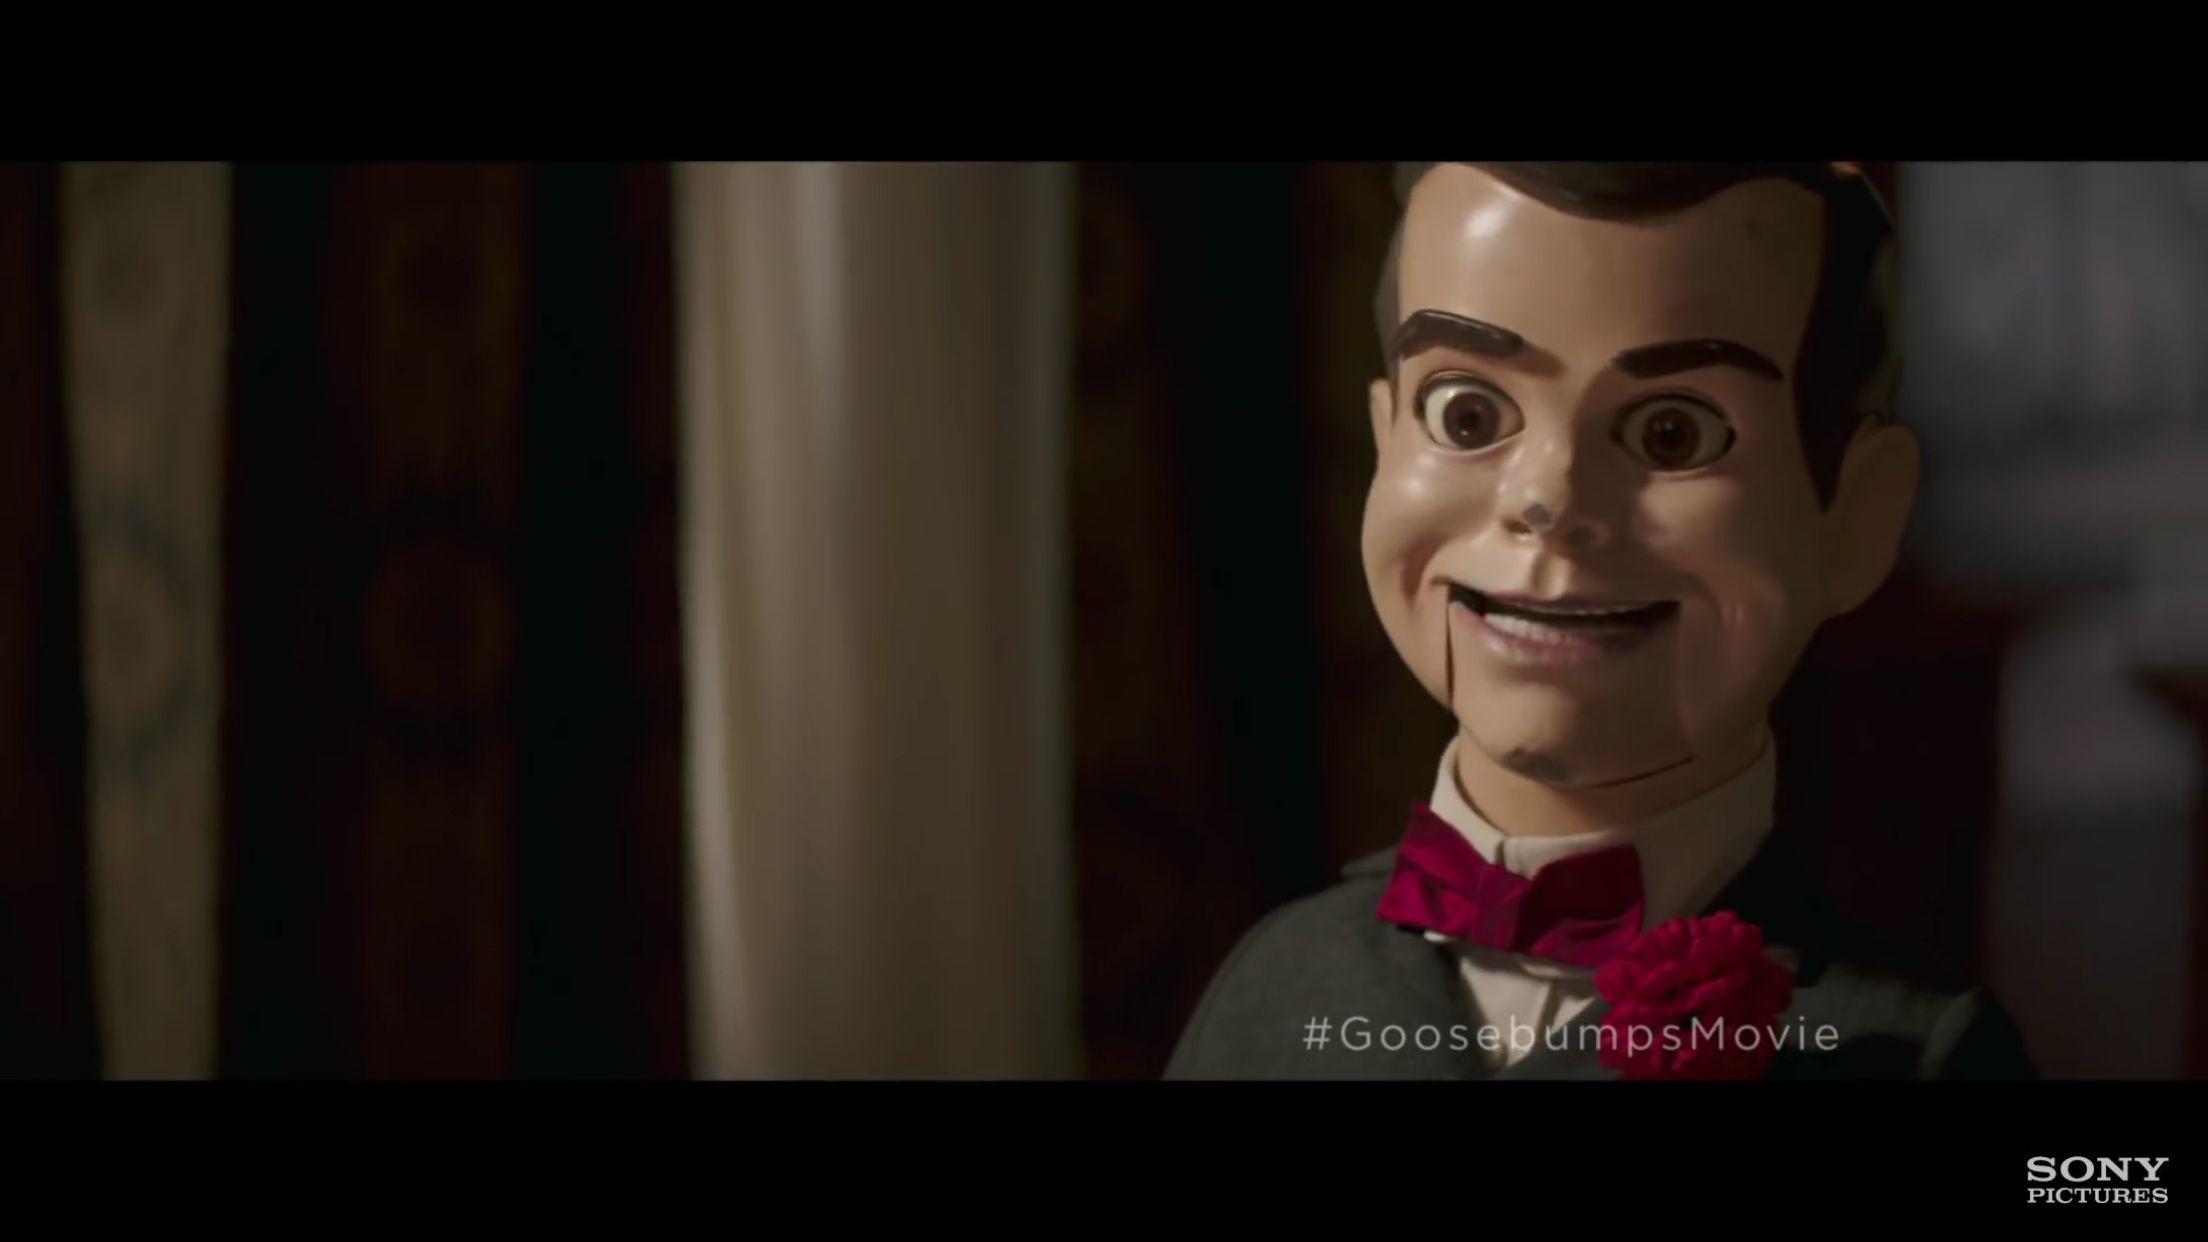 Slappy The Dummy Goosebumps Movie Slappy The Dummy Goosebumps Ghost